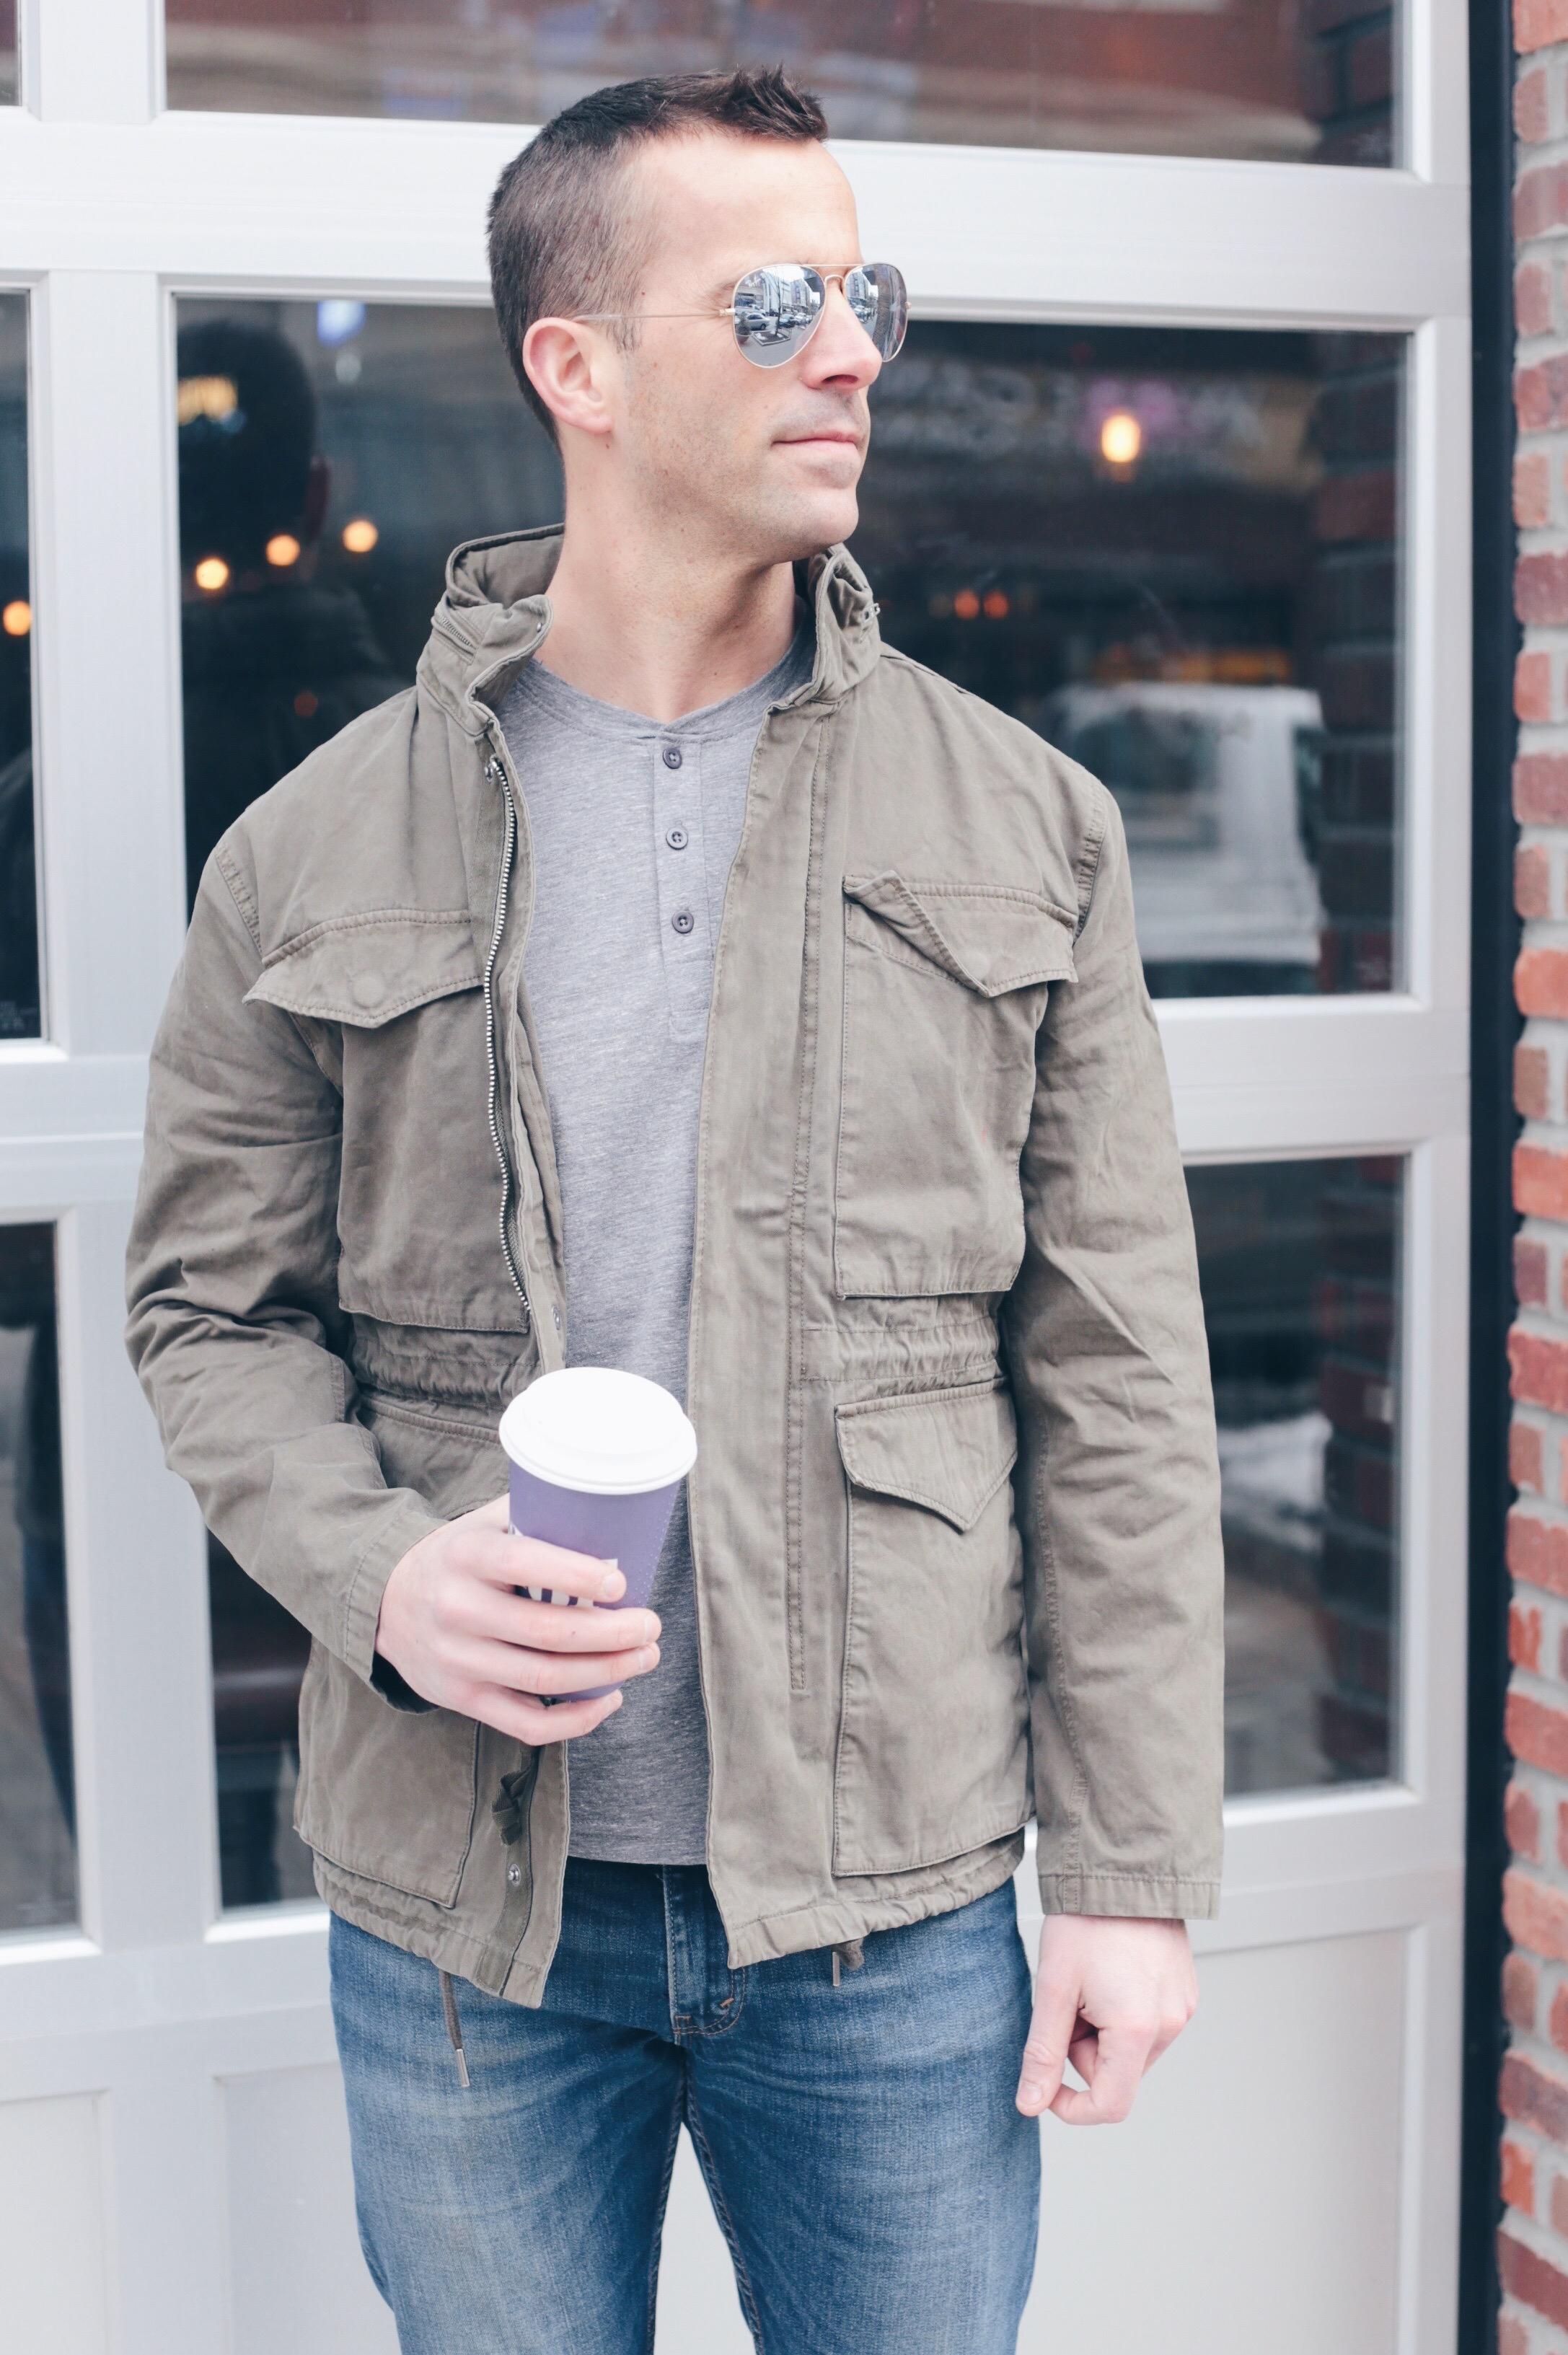 men's spring capsule wardrobe 2019 - men's utility jacket outfit